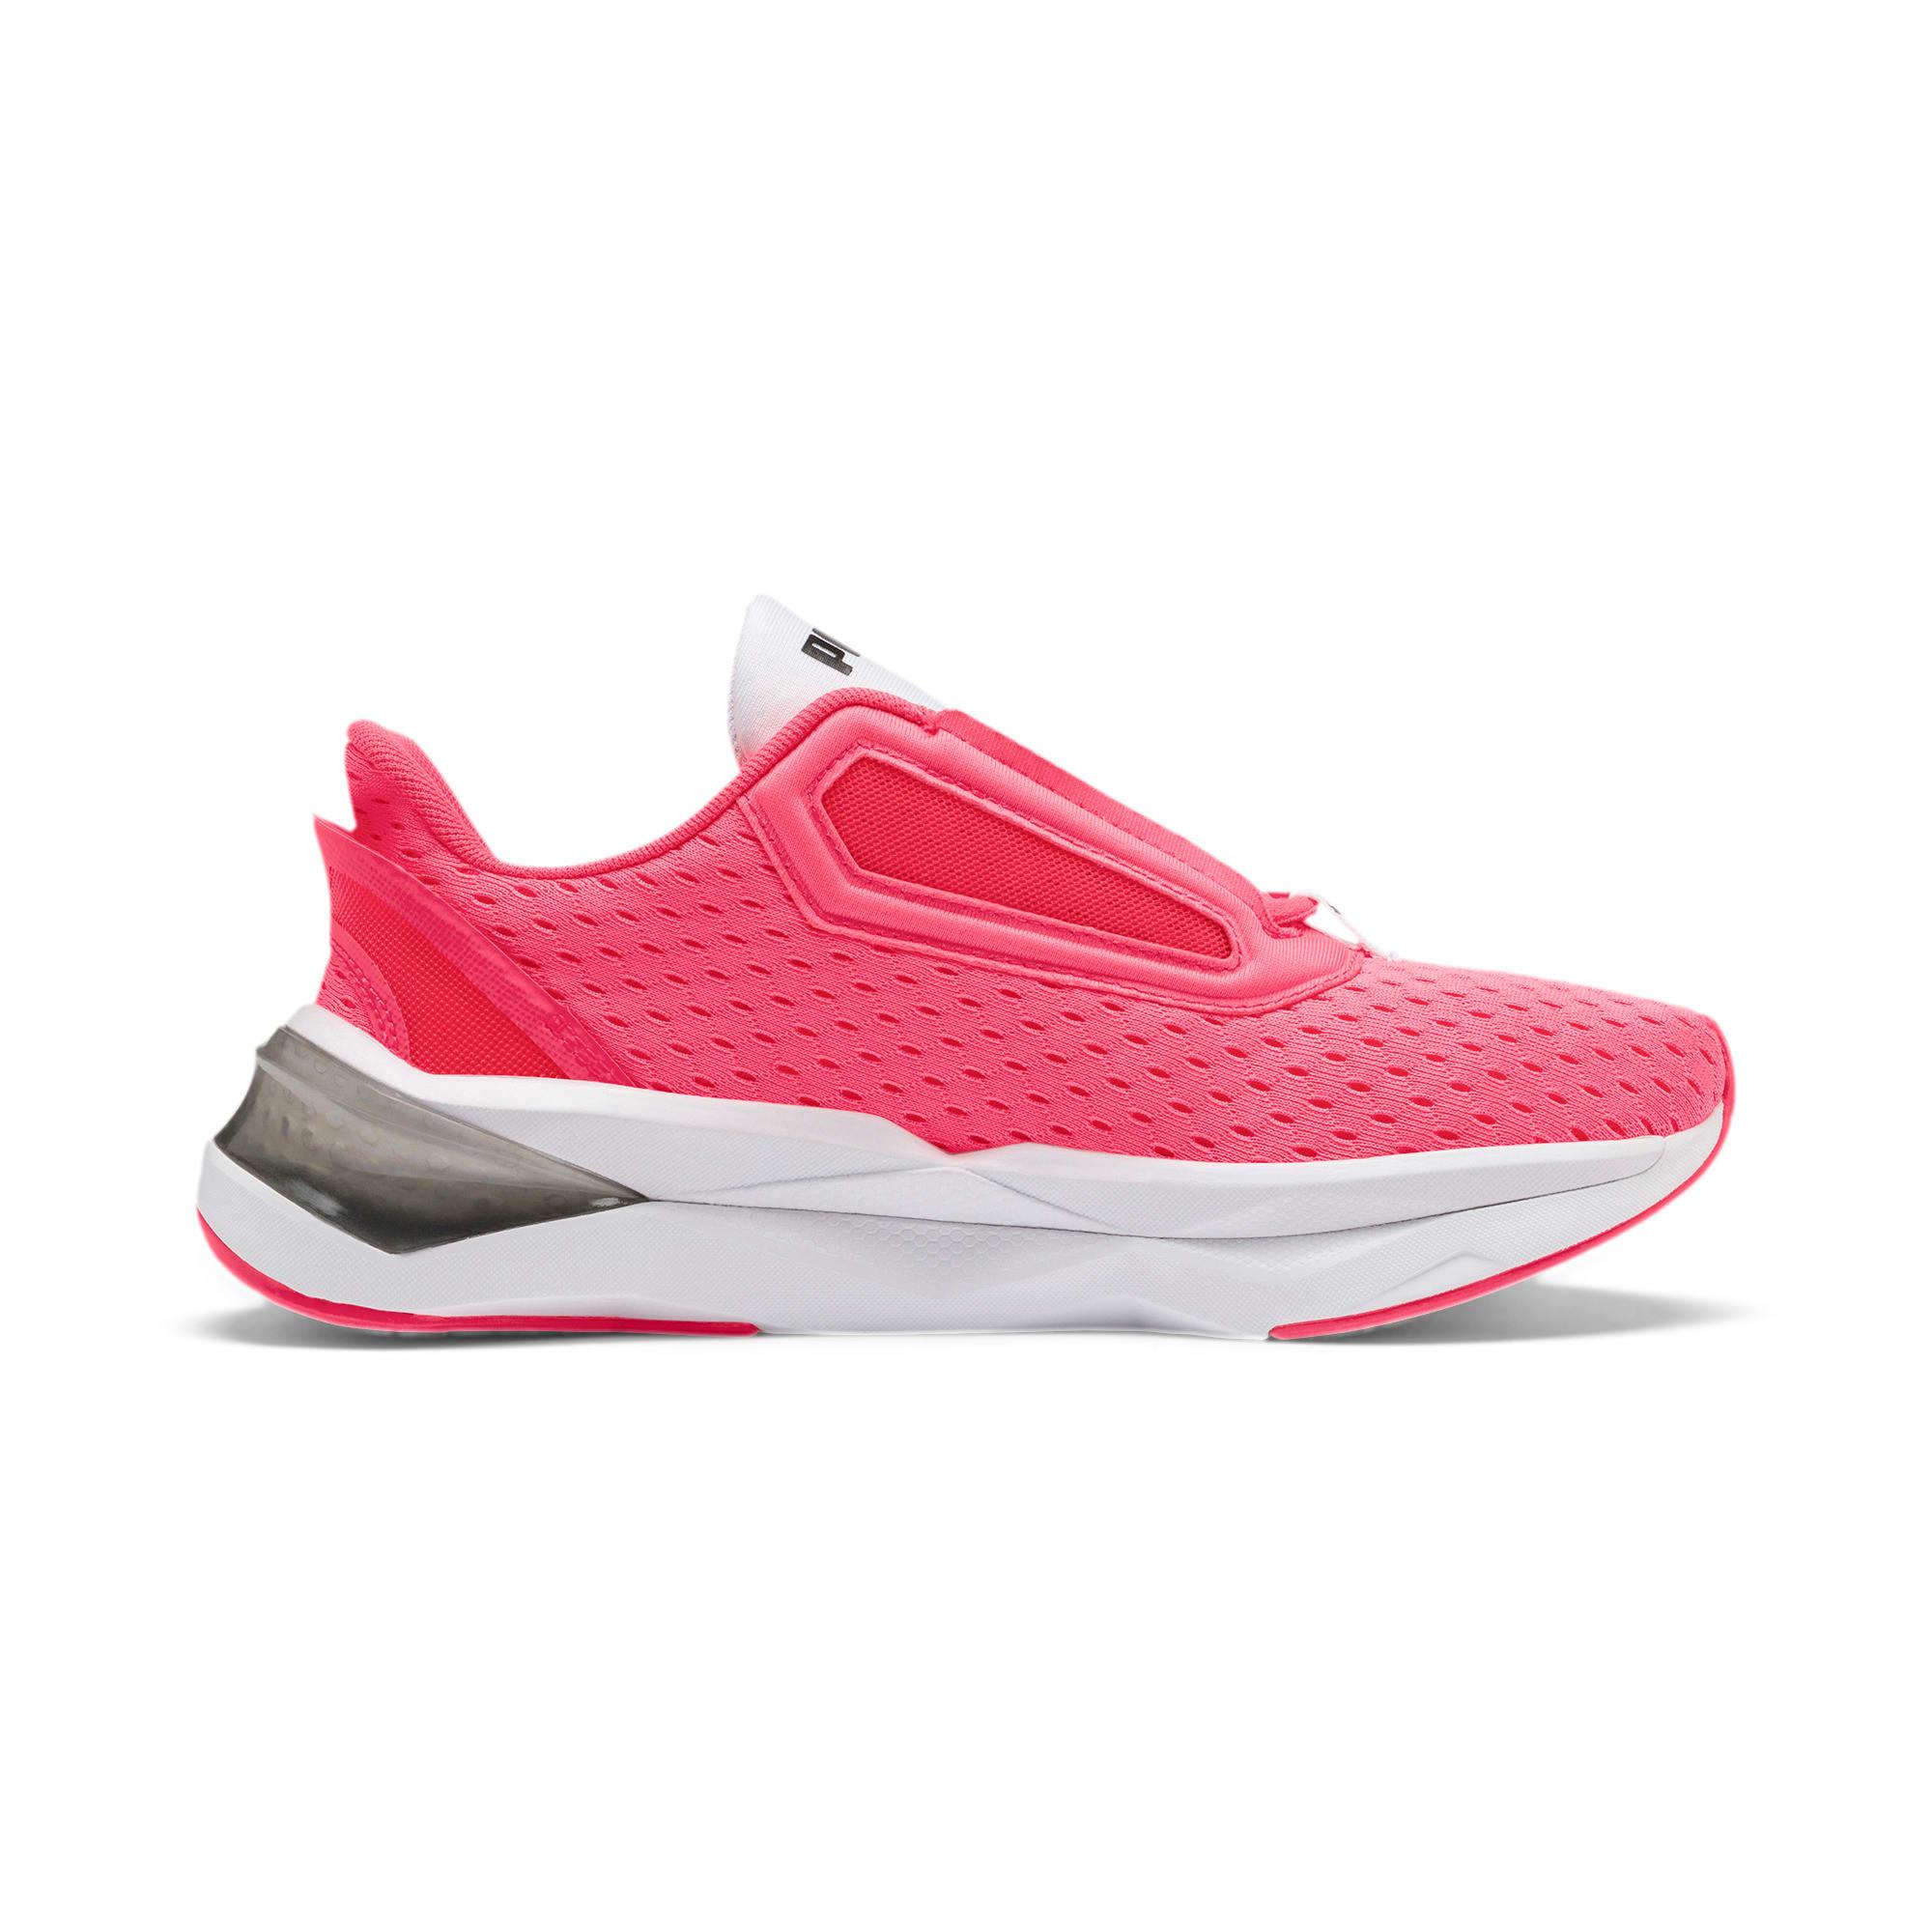 Thumbnail 9 of LQDCELL Shatter XT Women's Training Shoes, Pink Alert-Puma White, medium